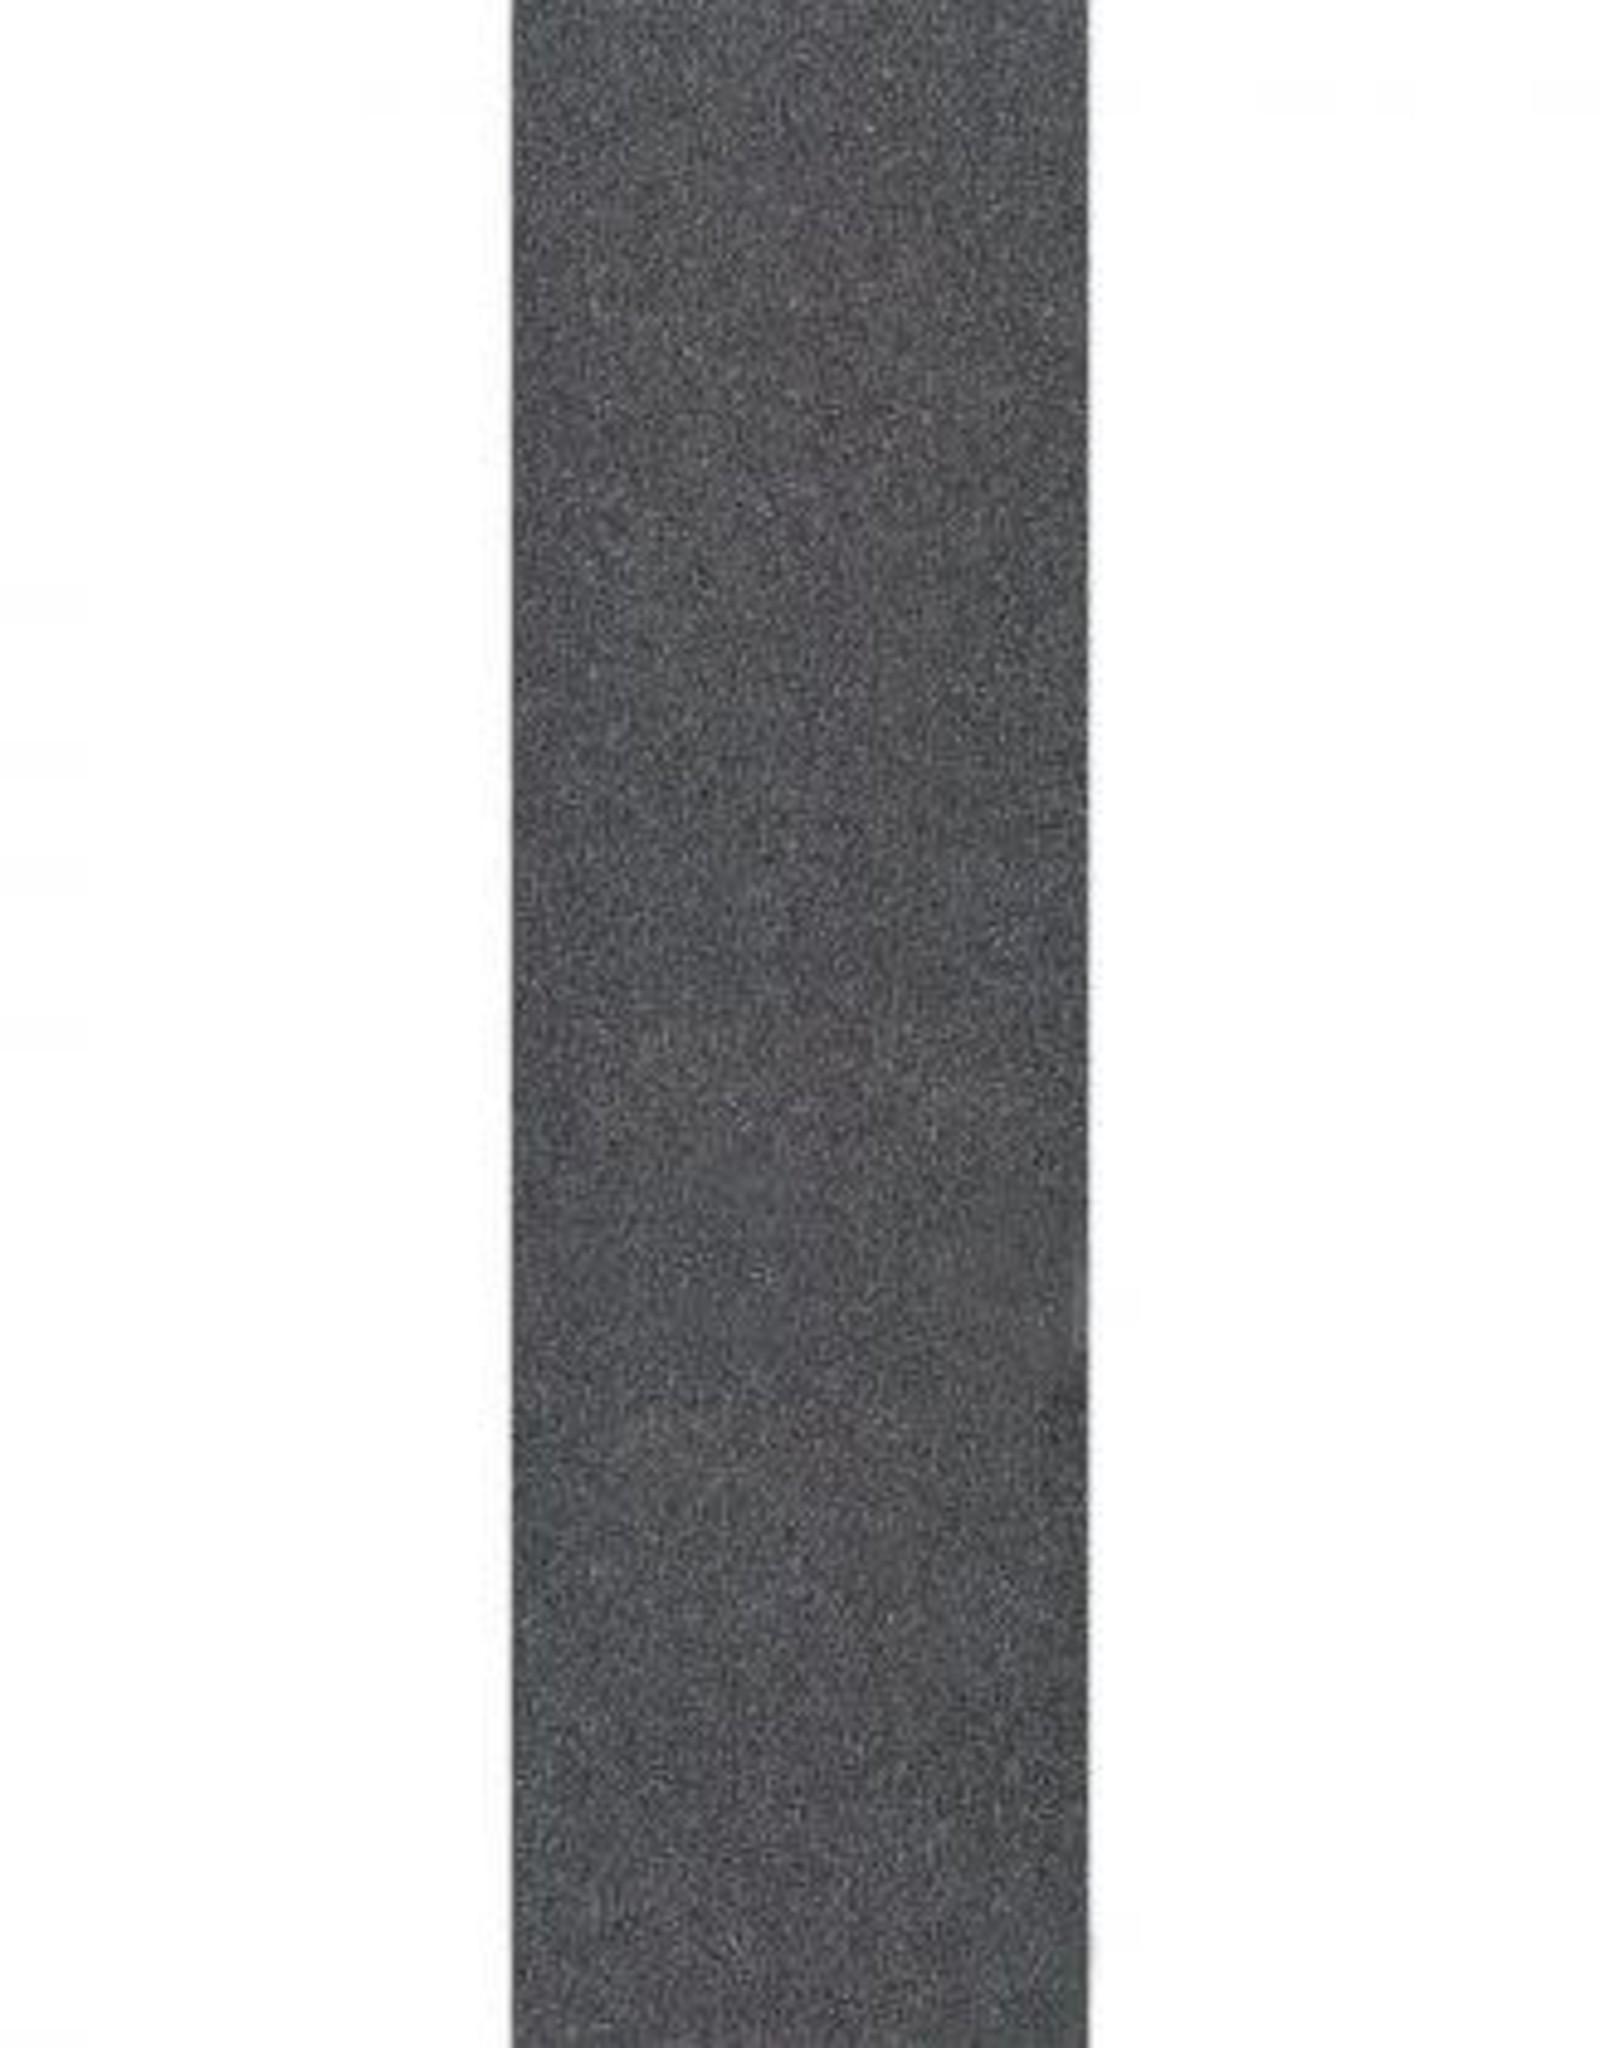 MOB Grip Tape